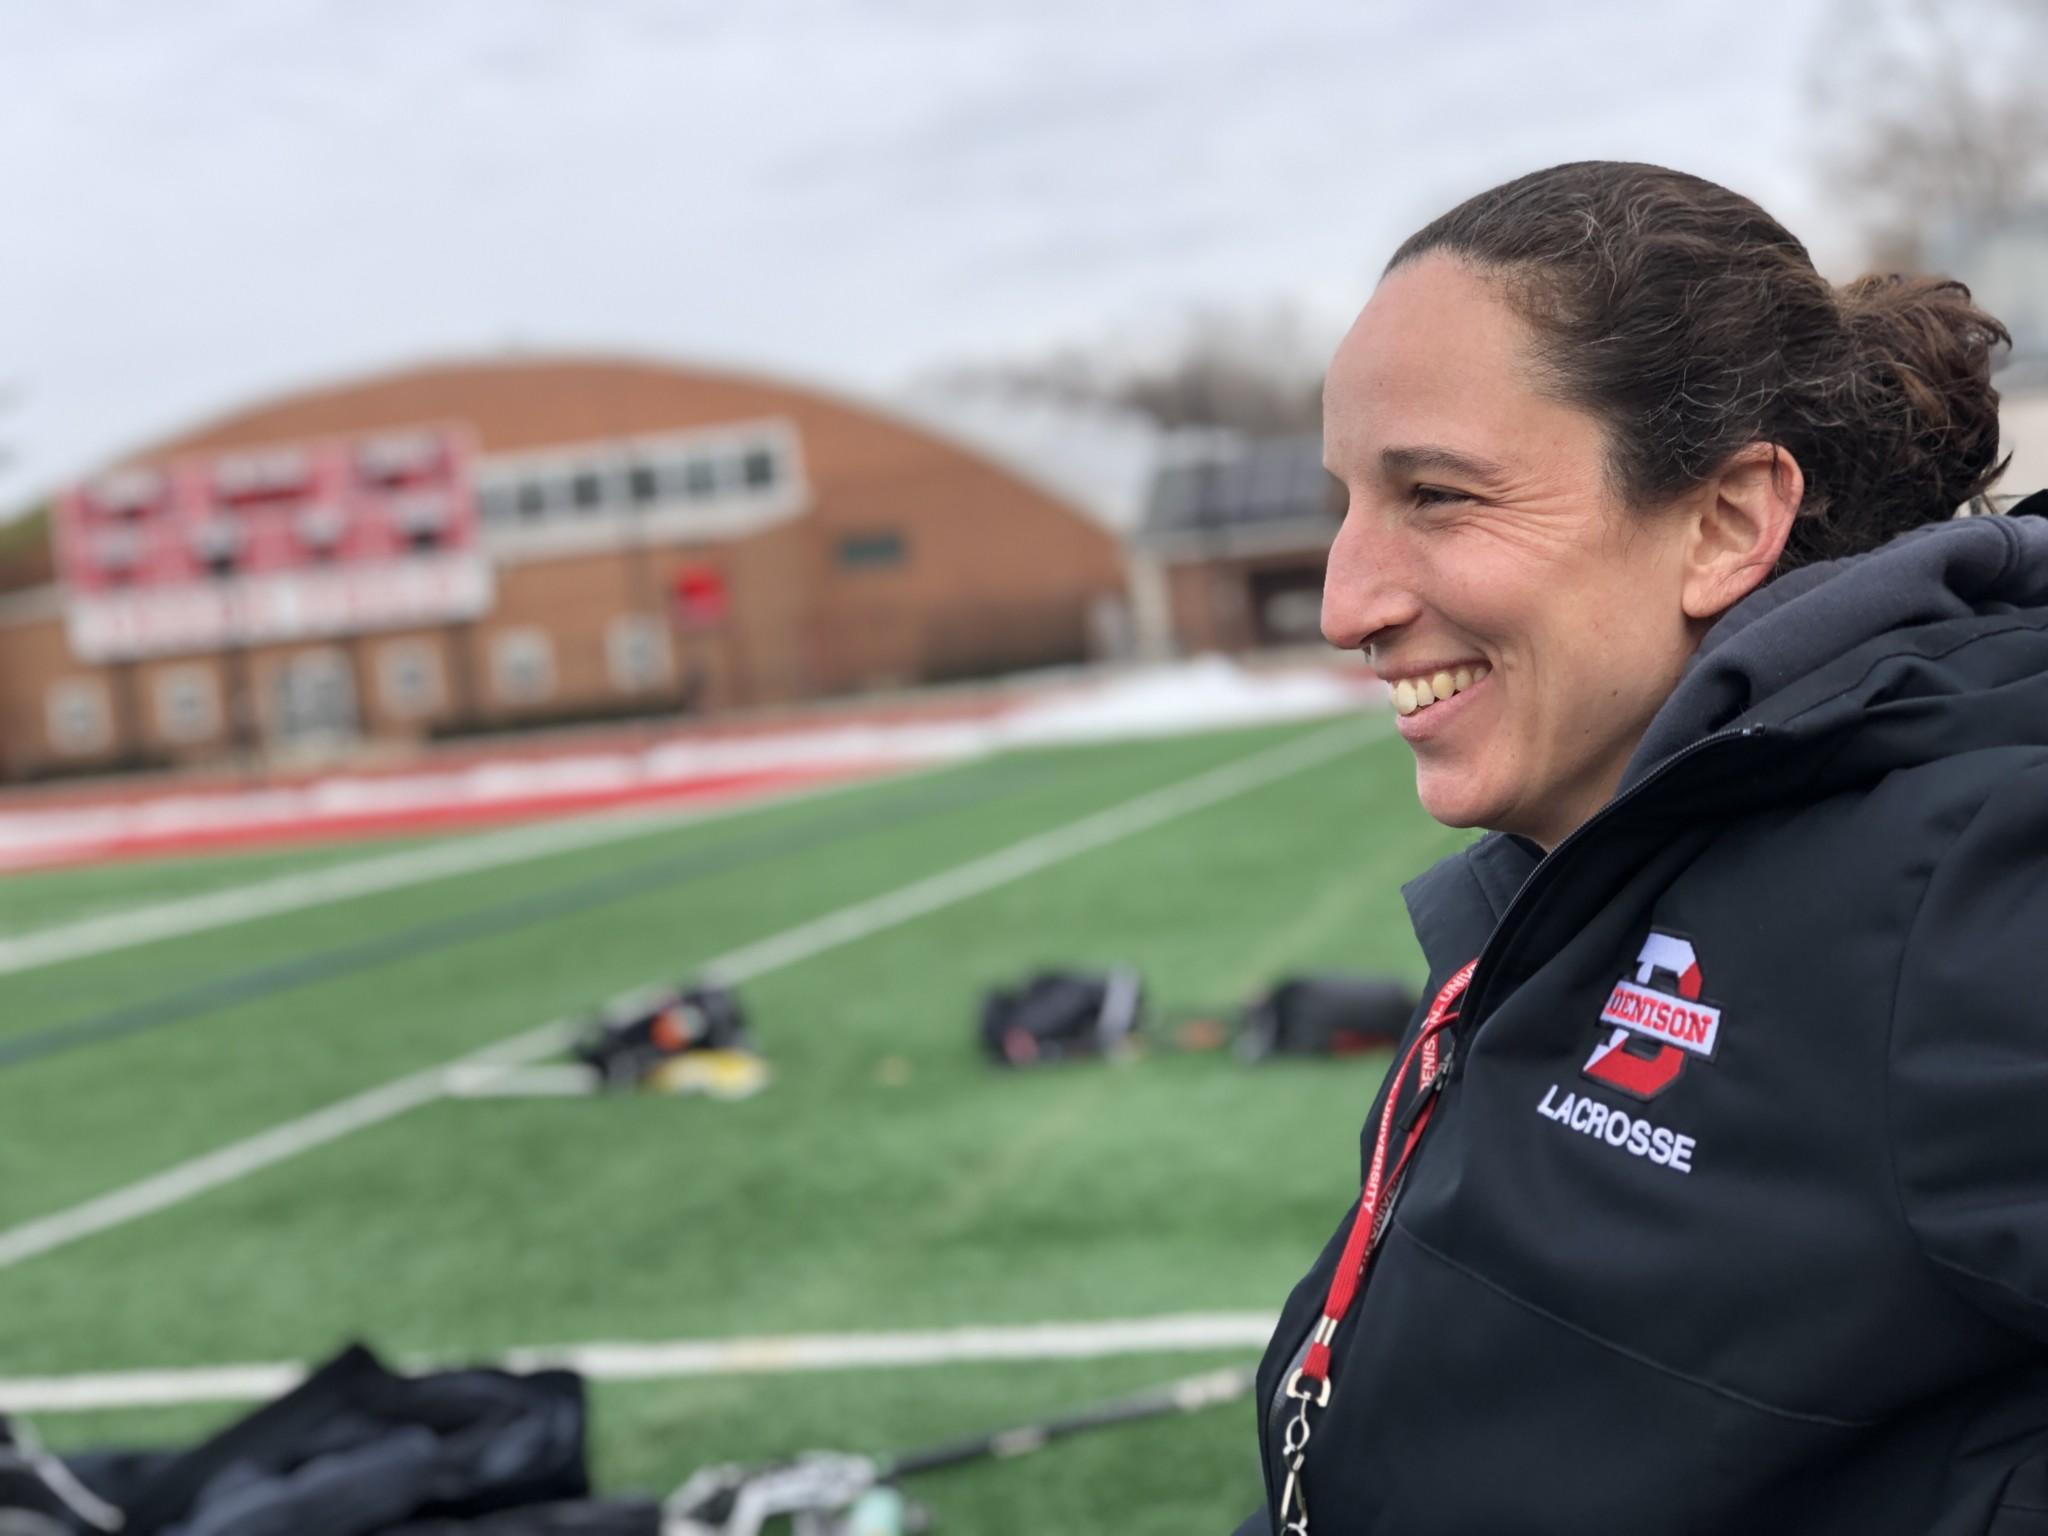 Amanda   Daniels, Head Women's Lacrosse Coach